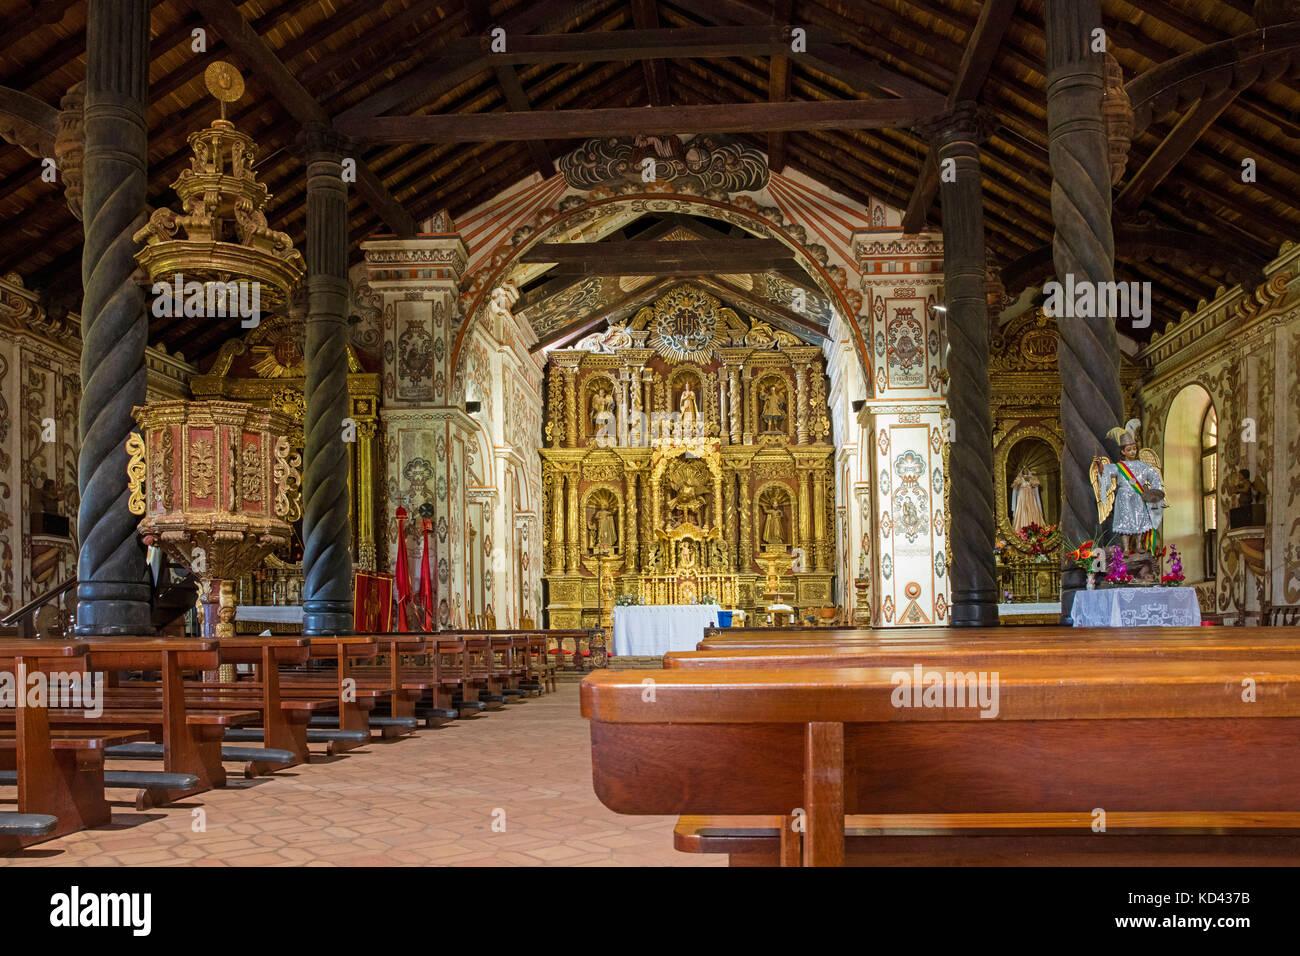 Interior of the Jesuit Mission church of San José de Chiquitos, Chiquitos Province, Santa Cruz, Bolivia - Stock Image